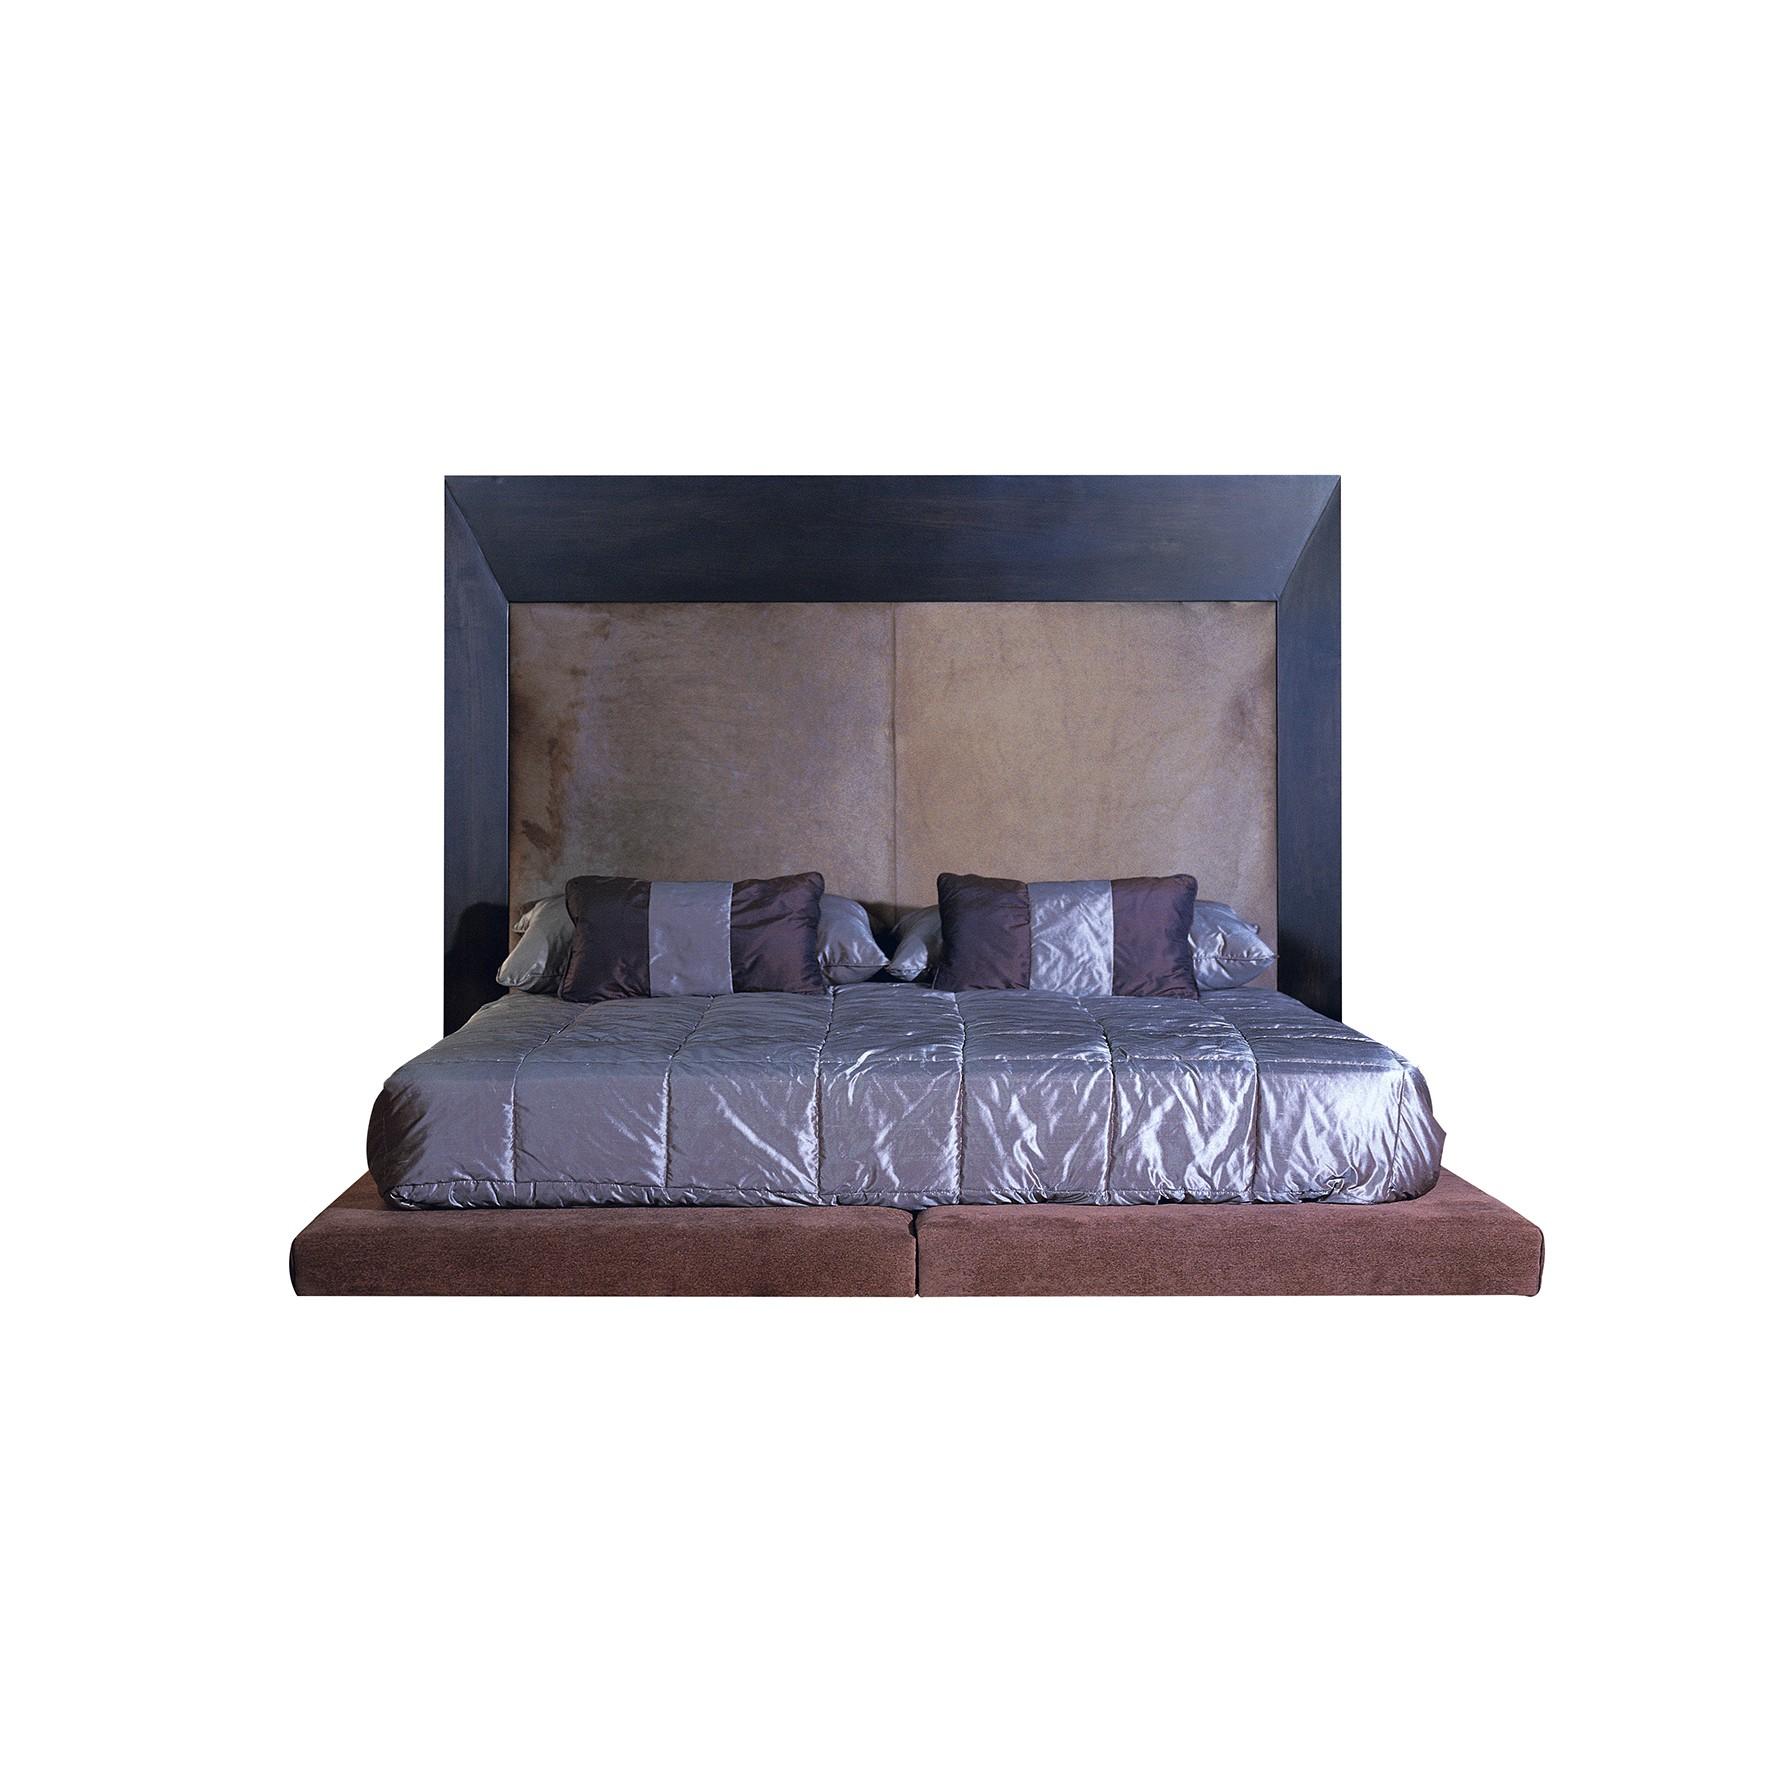 berta bed for 180x200 cm mattress. Black Bedroom Furniture Sets. Home Design Ideas